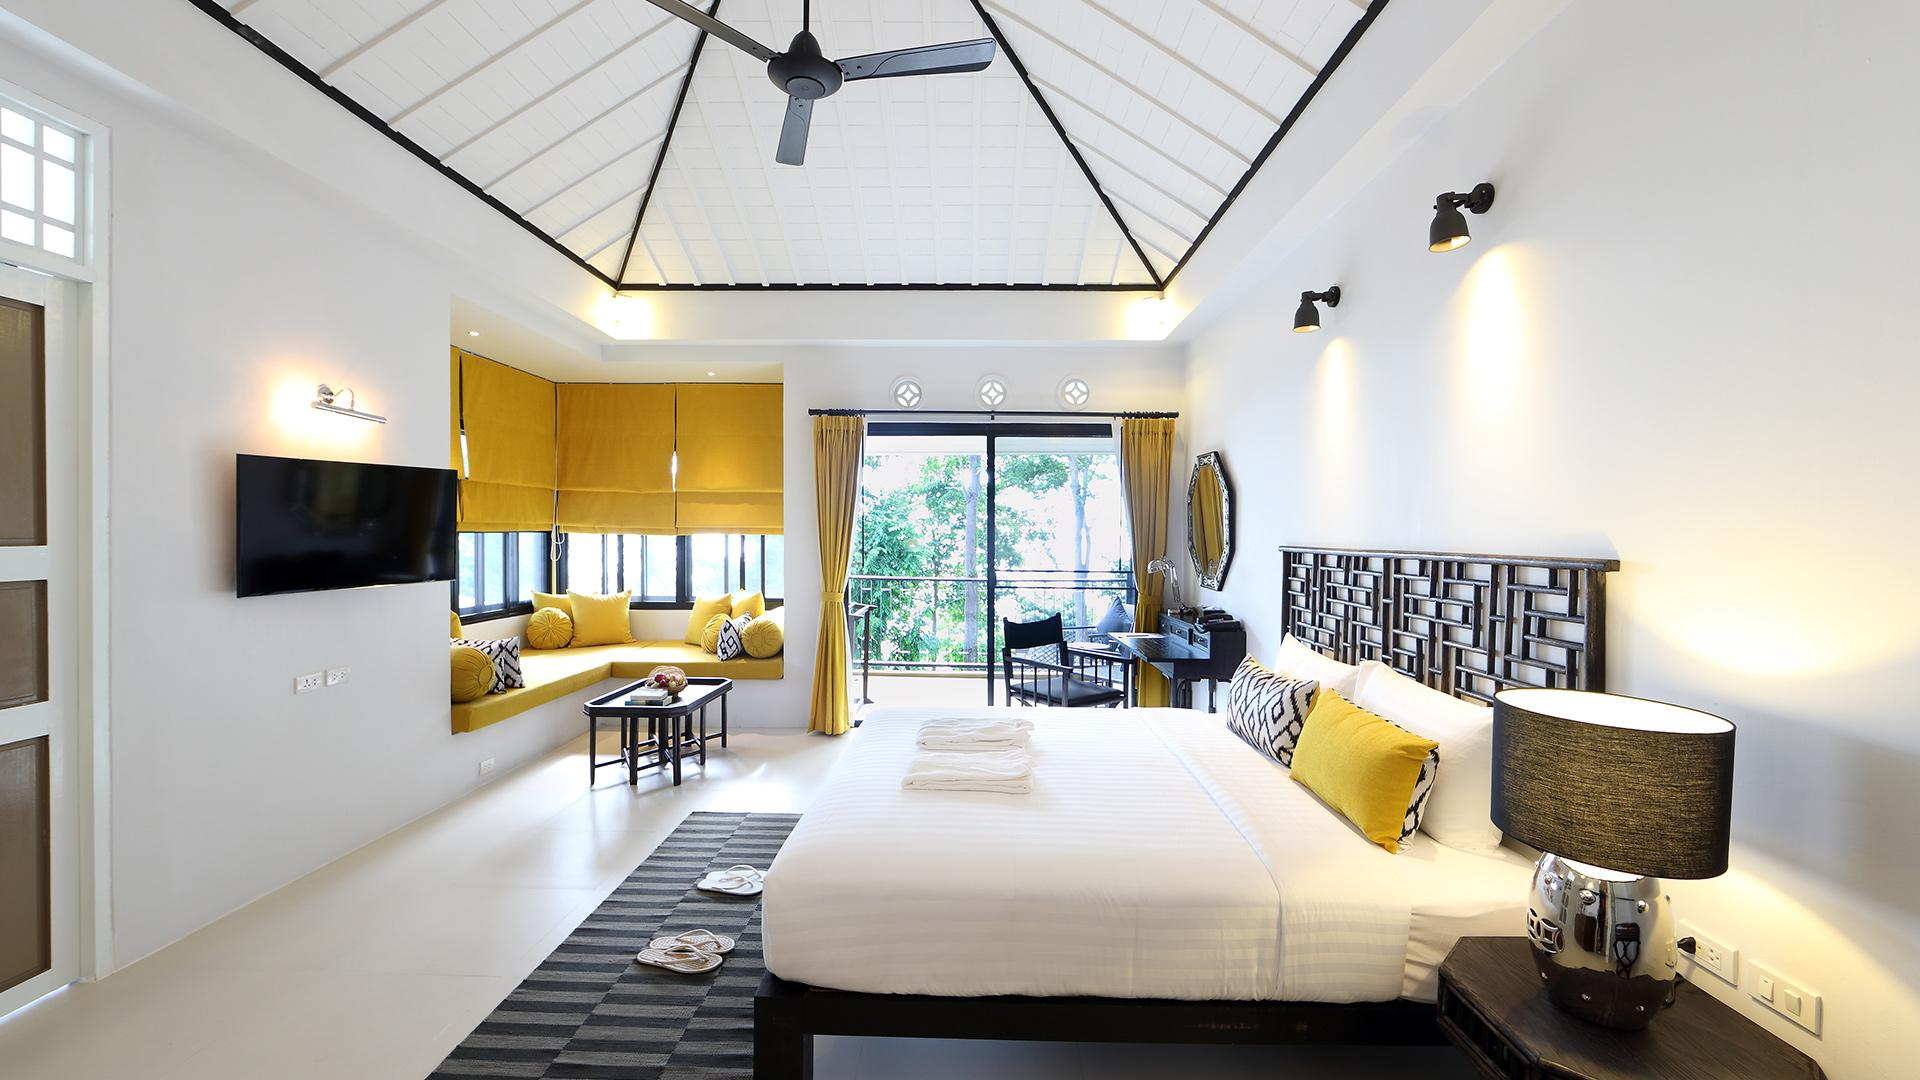 Hibiscus Grand Deluxe image 1 at Moracea by Khao Lak Resort by Amphoe Takua Pa, Chang Wat Phang-nga, Thailand